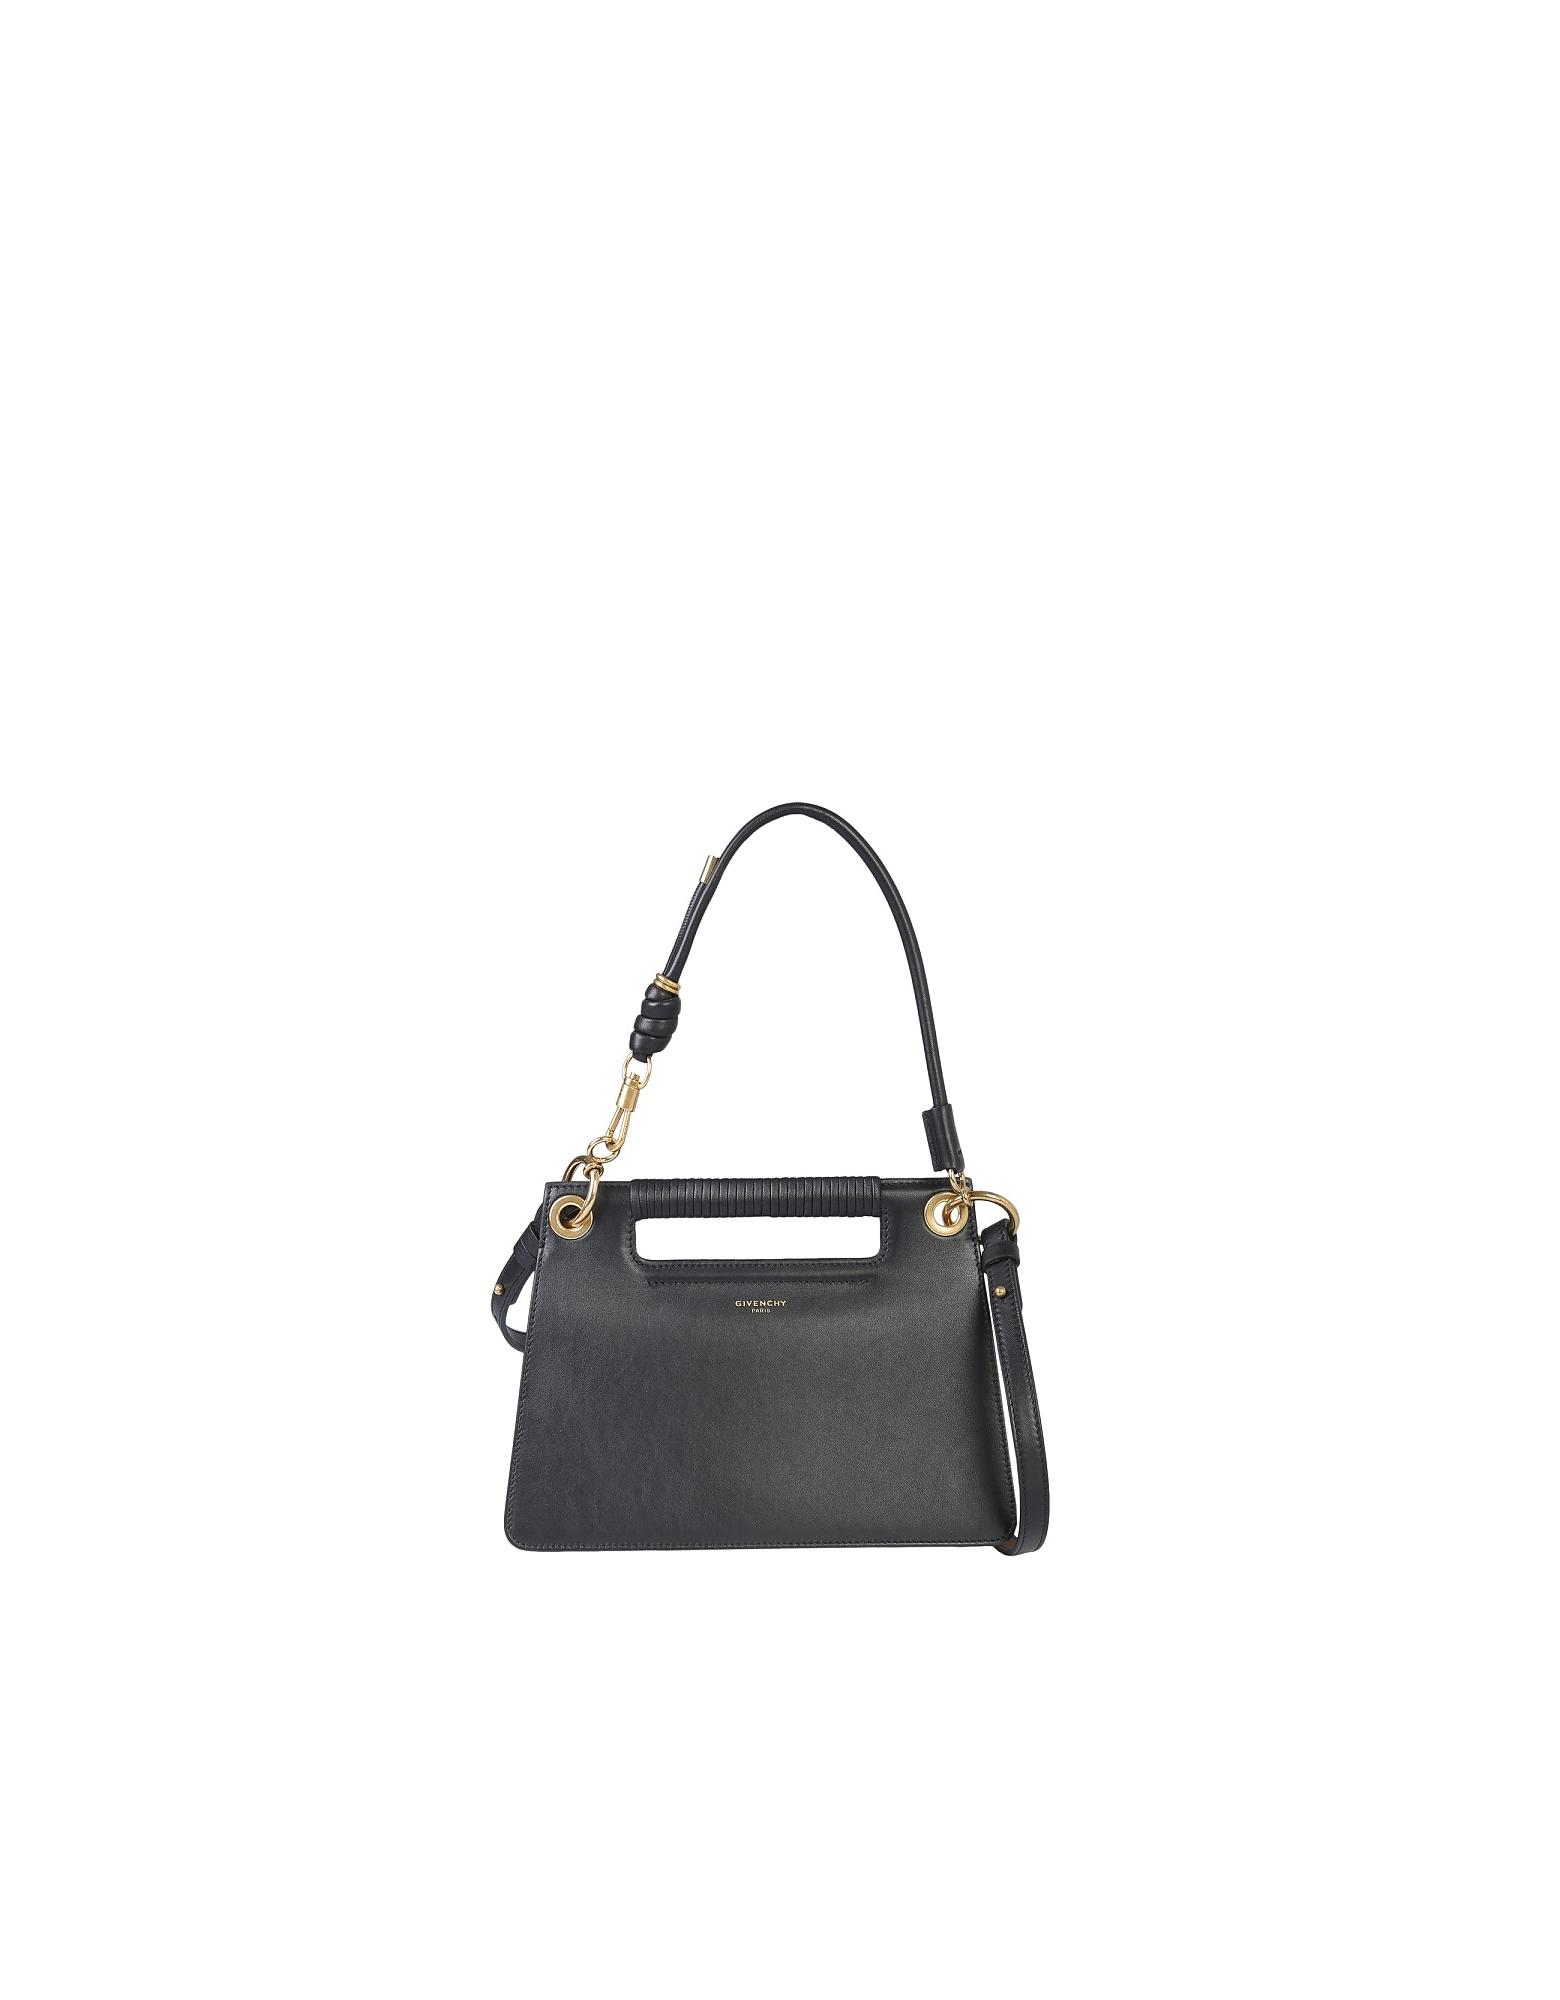 Givenchy Designer Handbags, Whip Bag